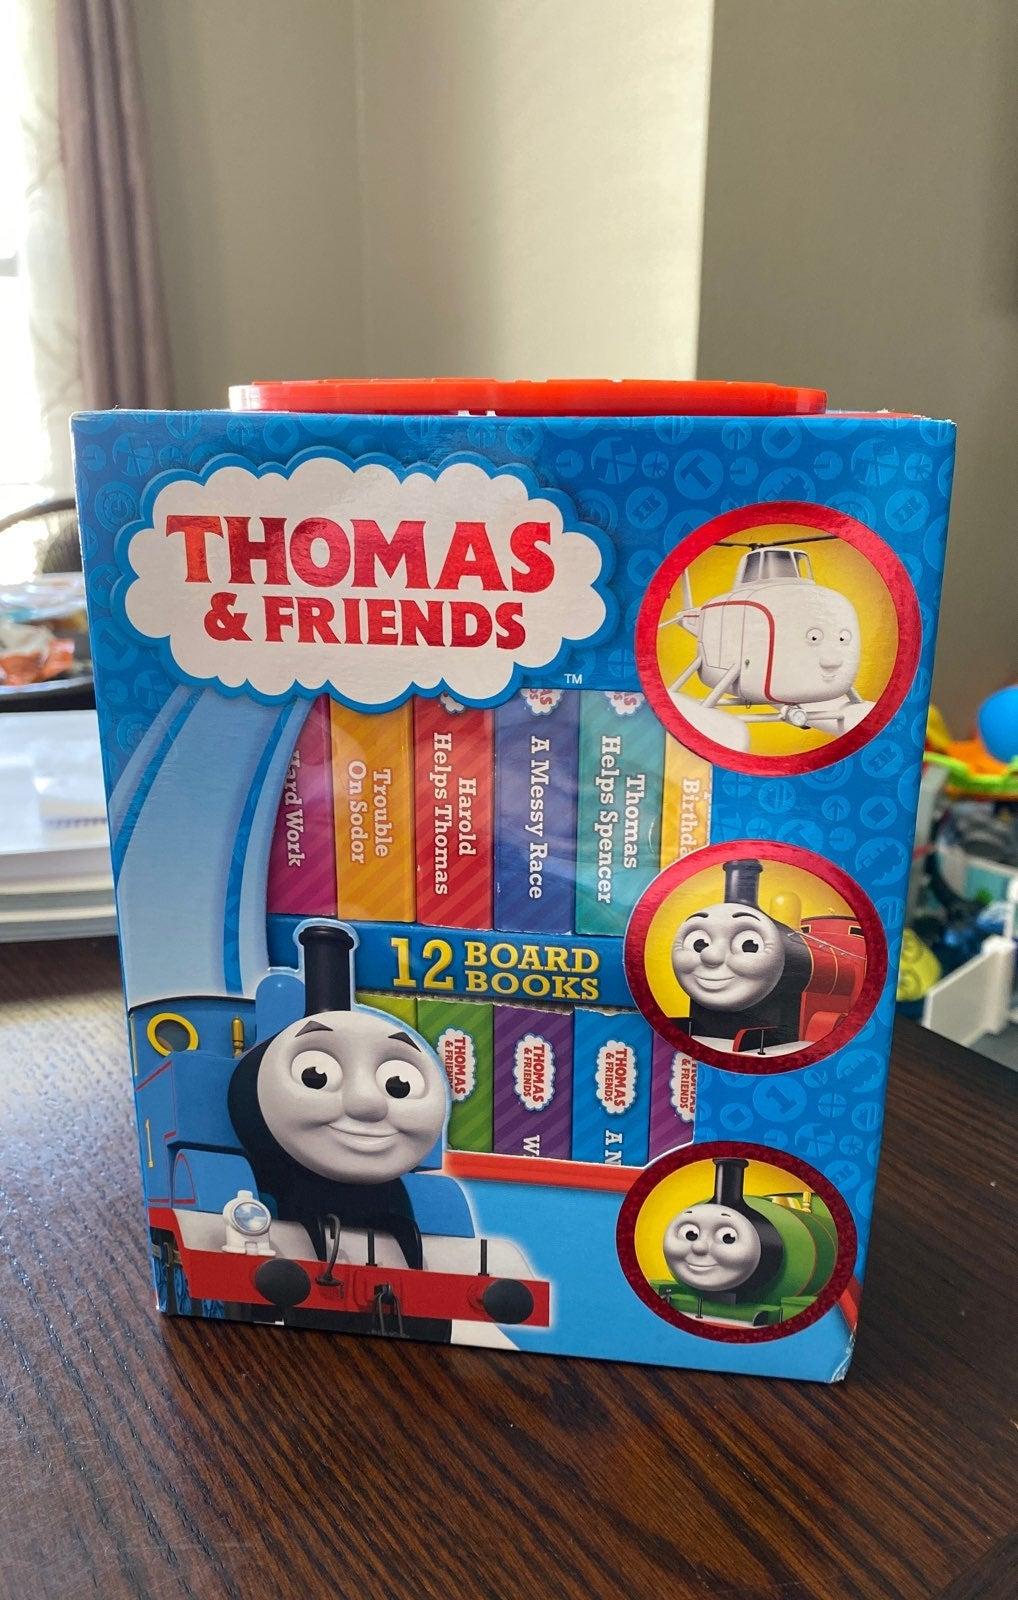 Thomas & friends little books